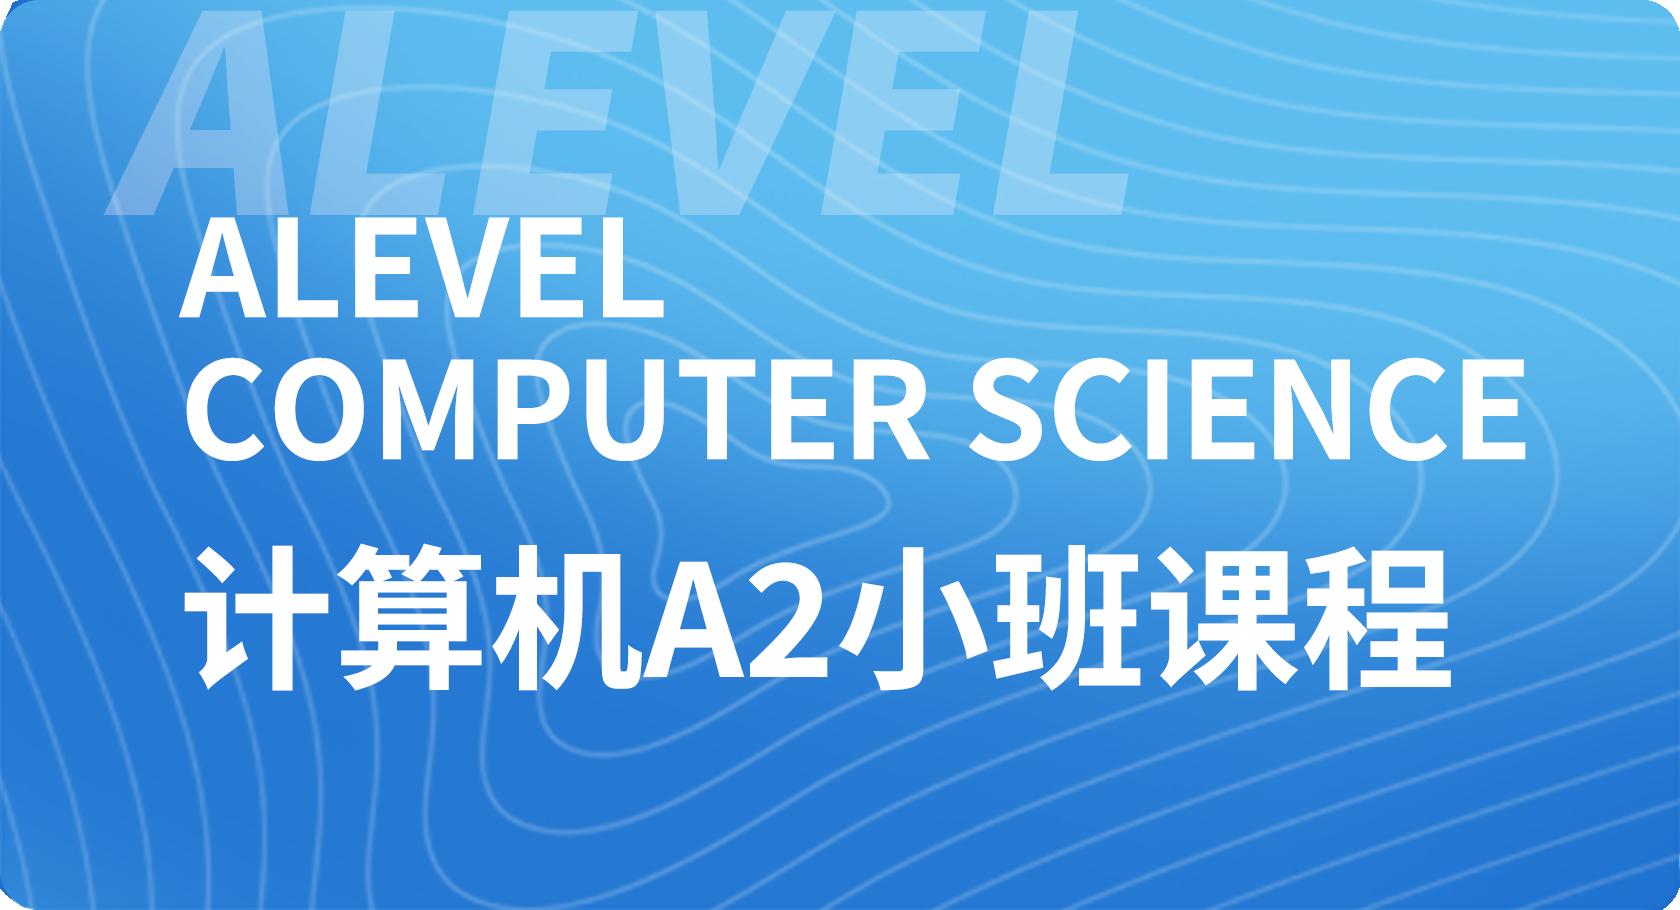 Alevel计算机A2小班课程